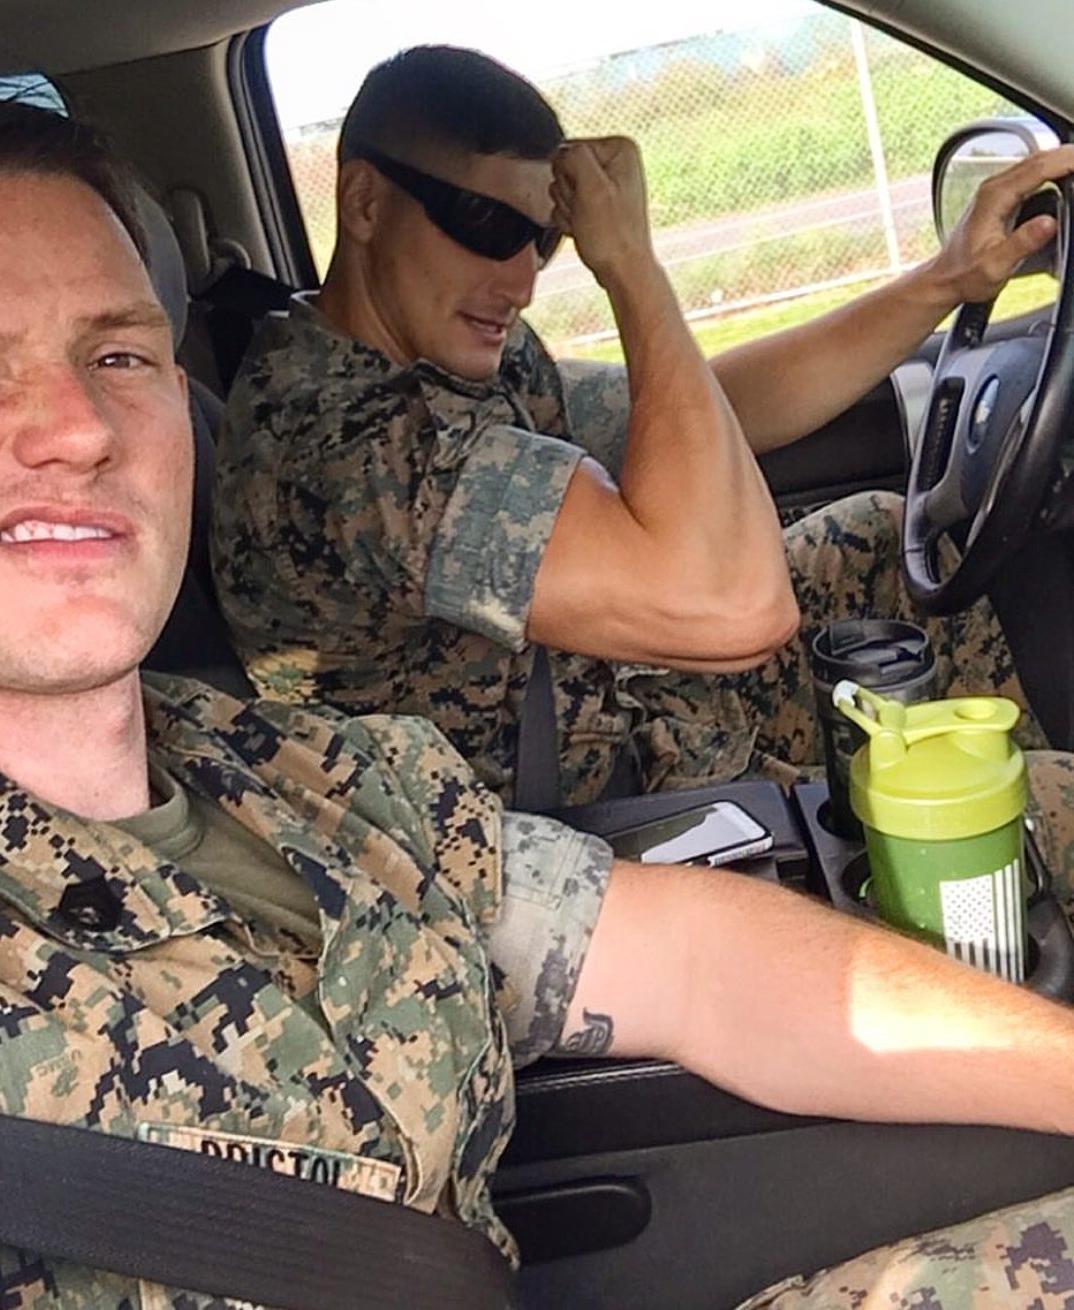 two-handsome-military-uniform-men-bicep-flex-car-ride-fun-male-soldiers